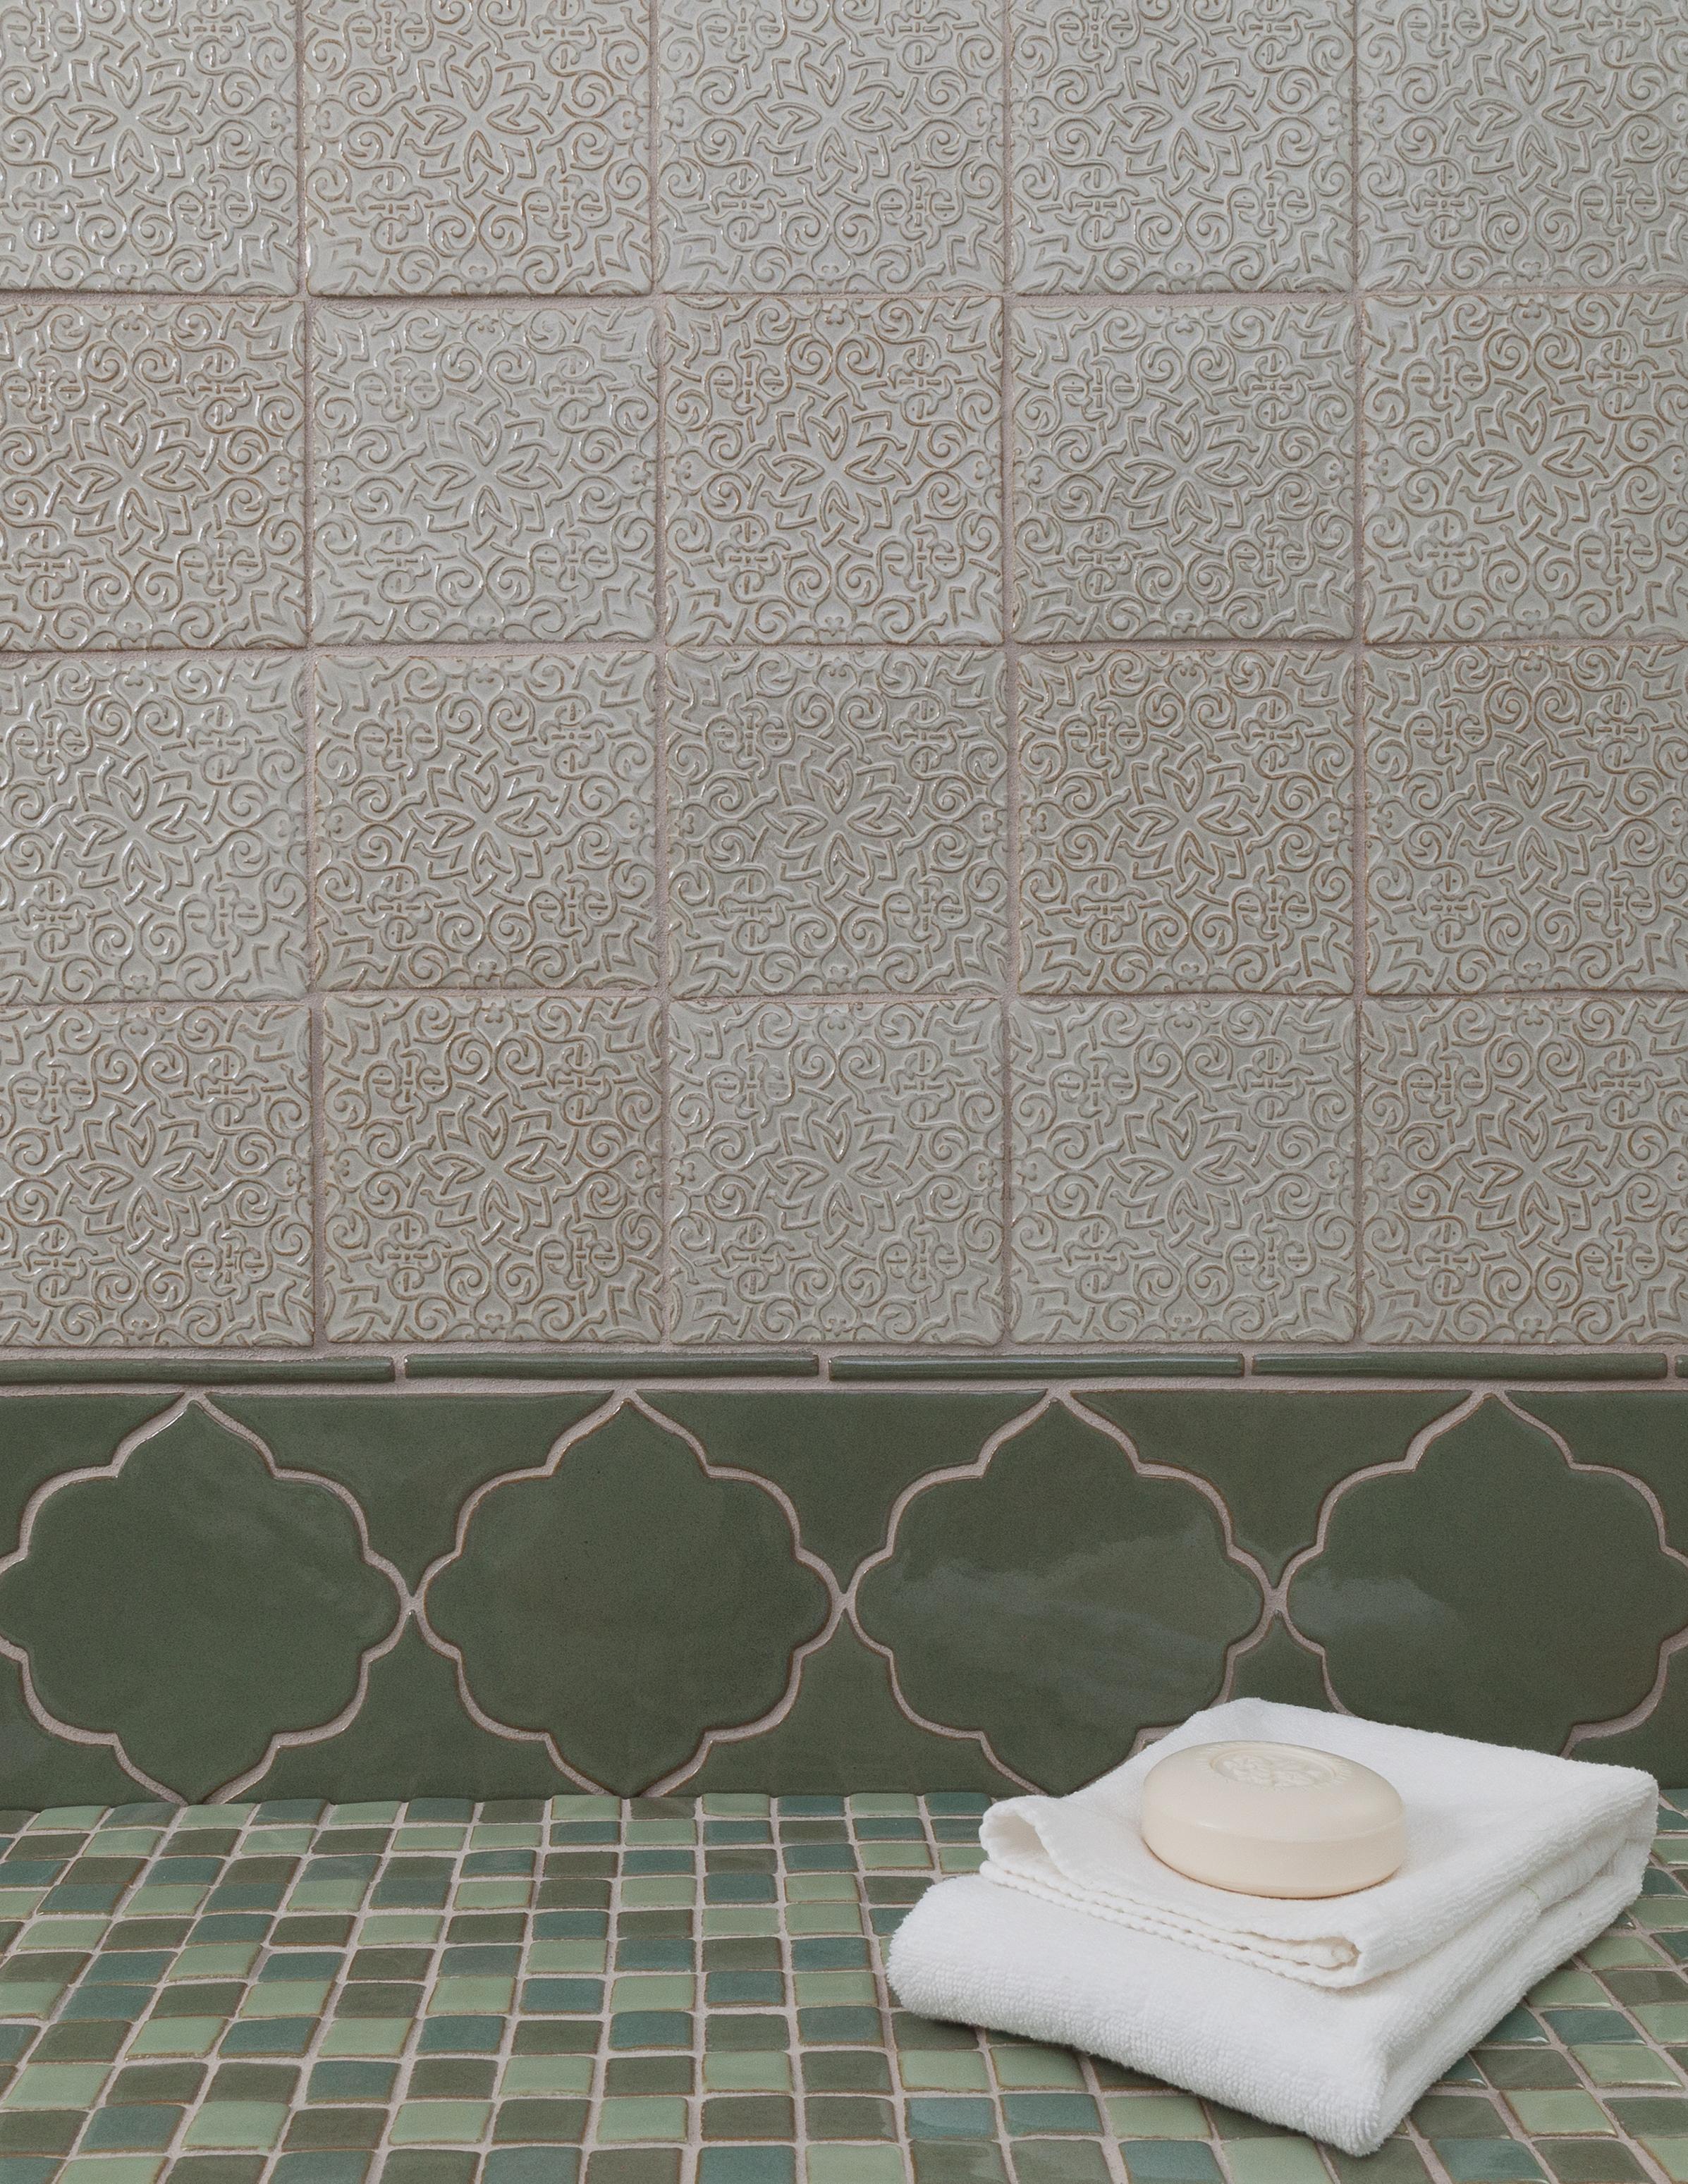 Fez textured field, Marrakesh Collection, Lilywork Artisan Tile.jpg